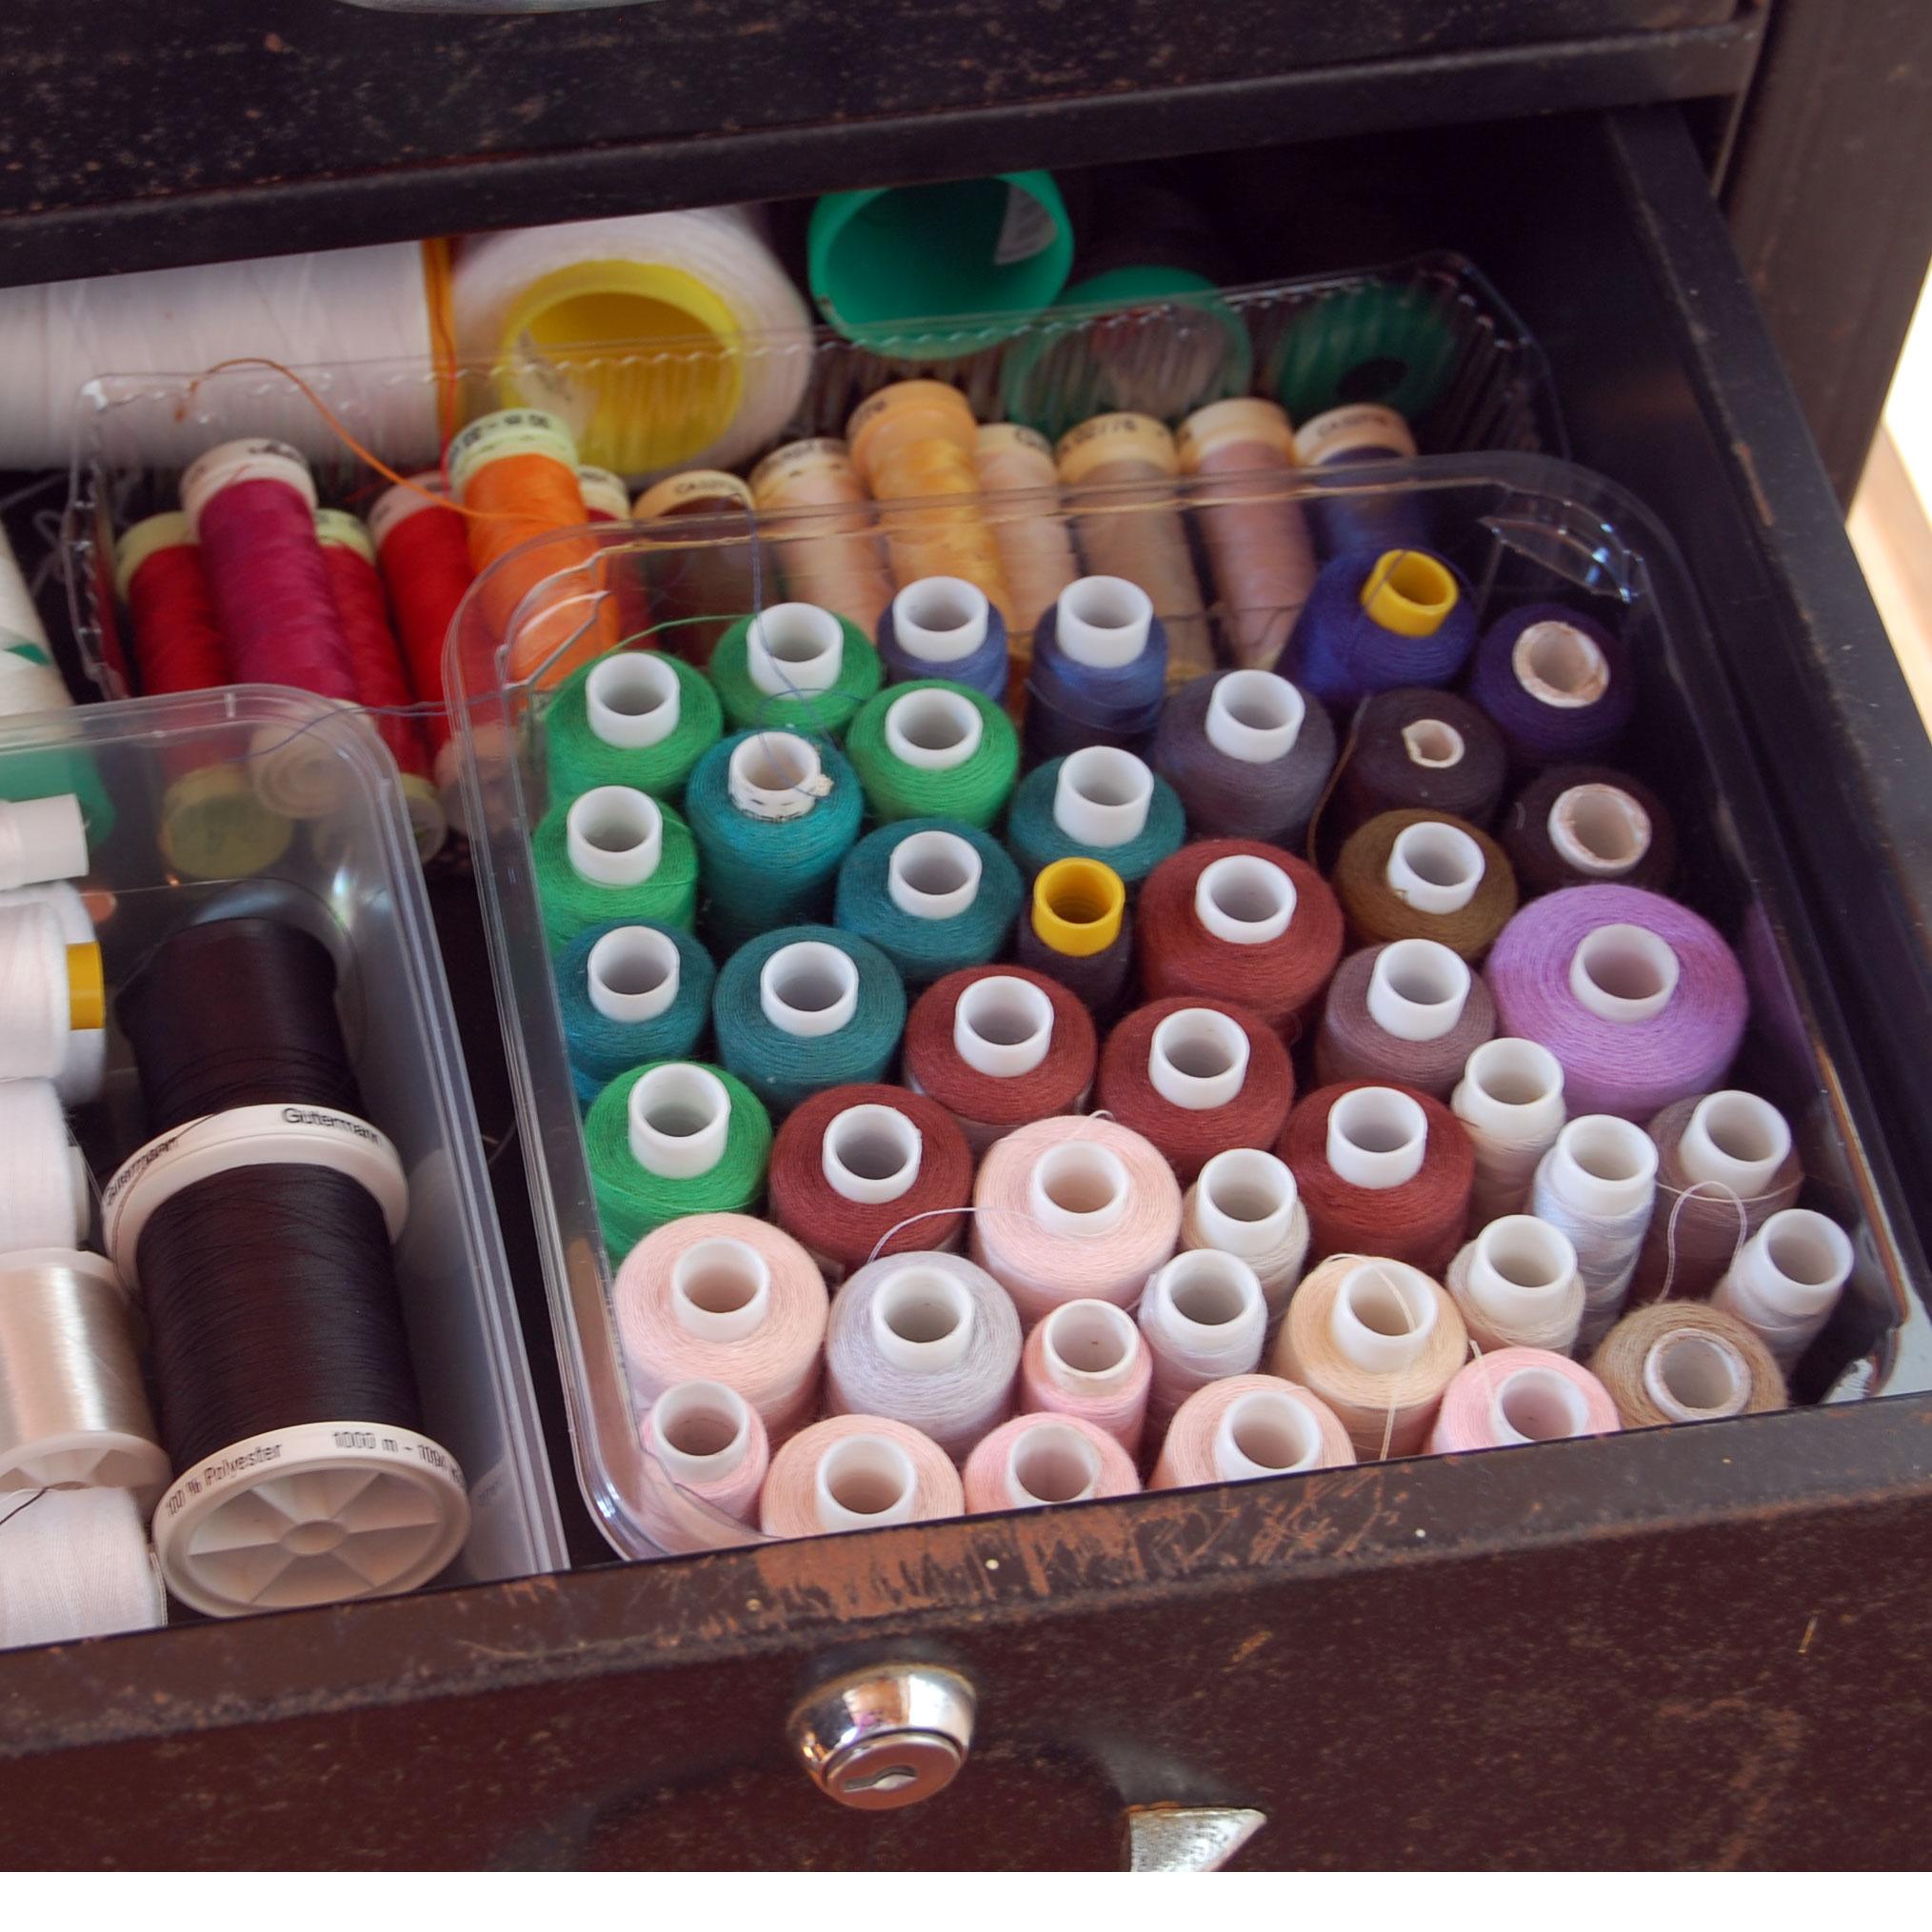 My thread now lives in regimented order inside an old desk drawer.